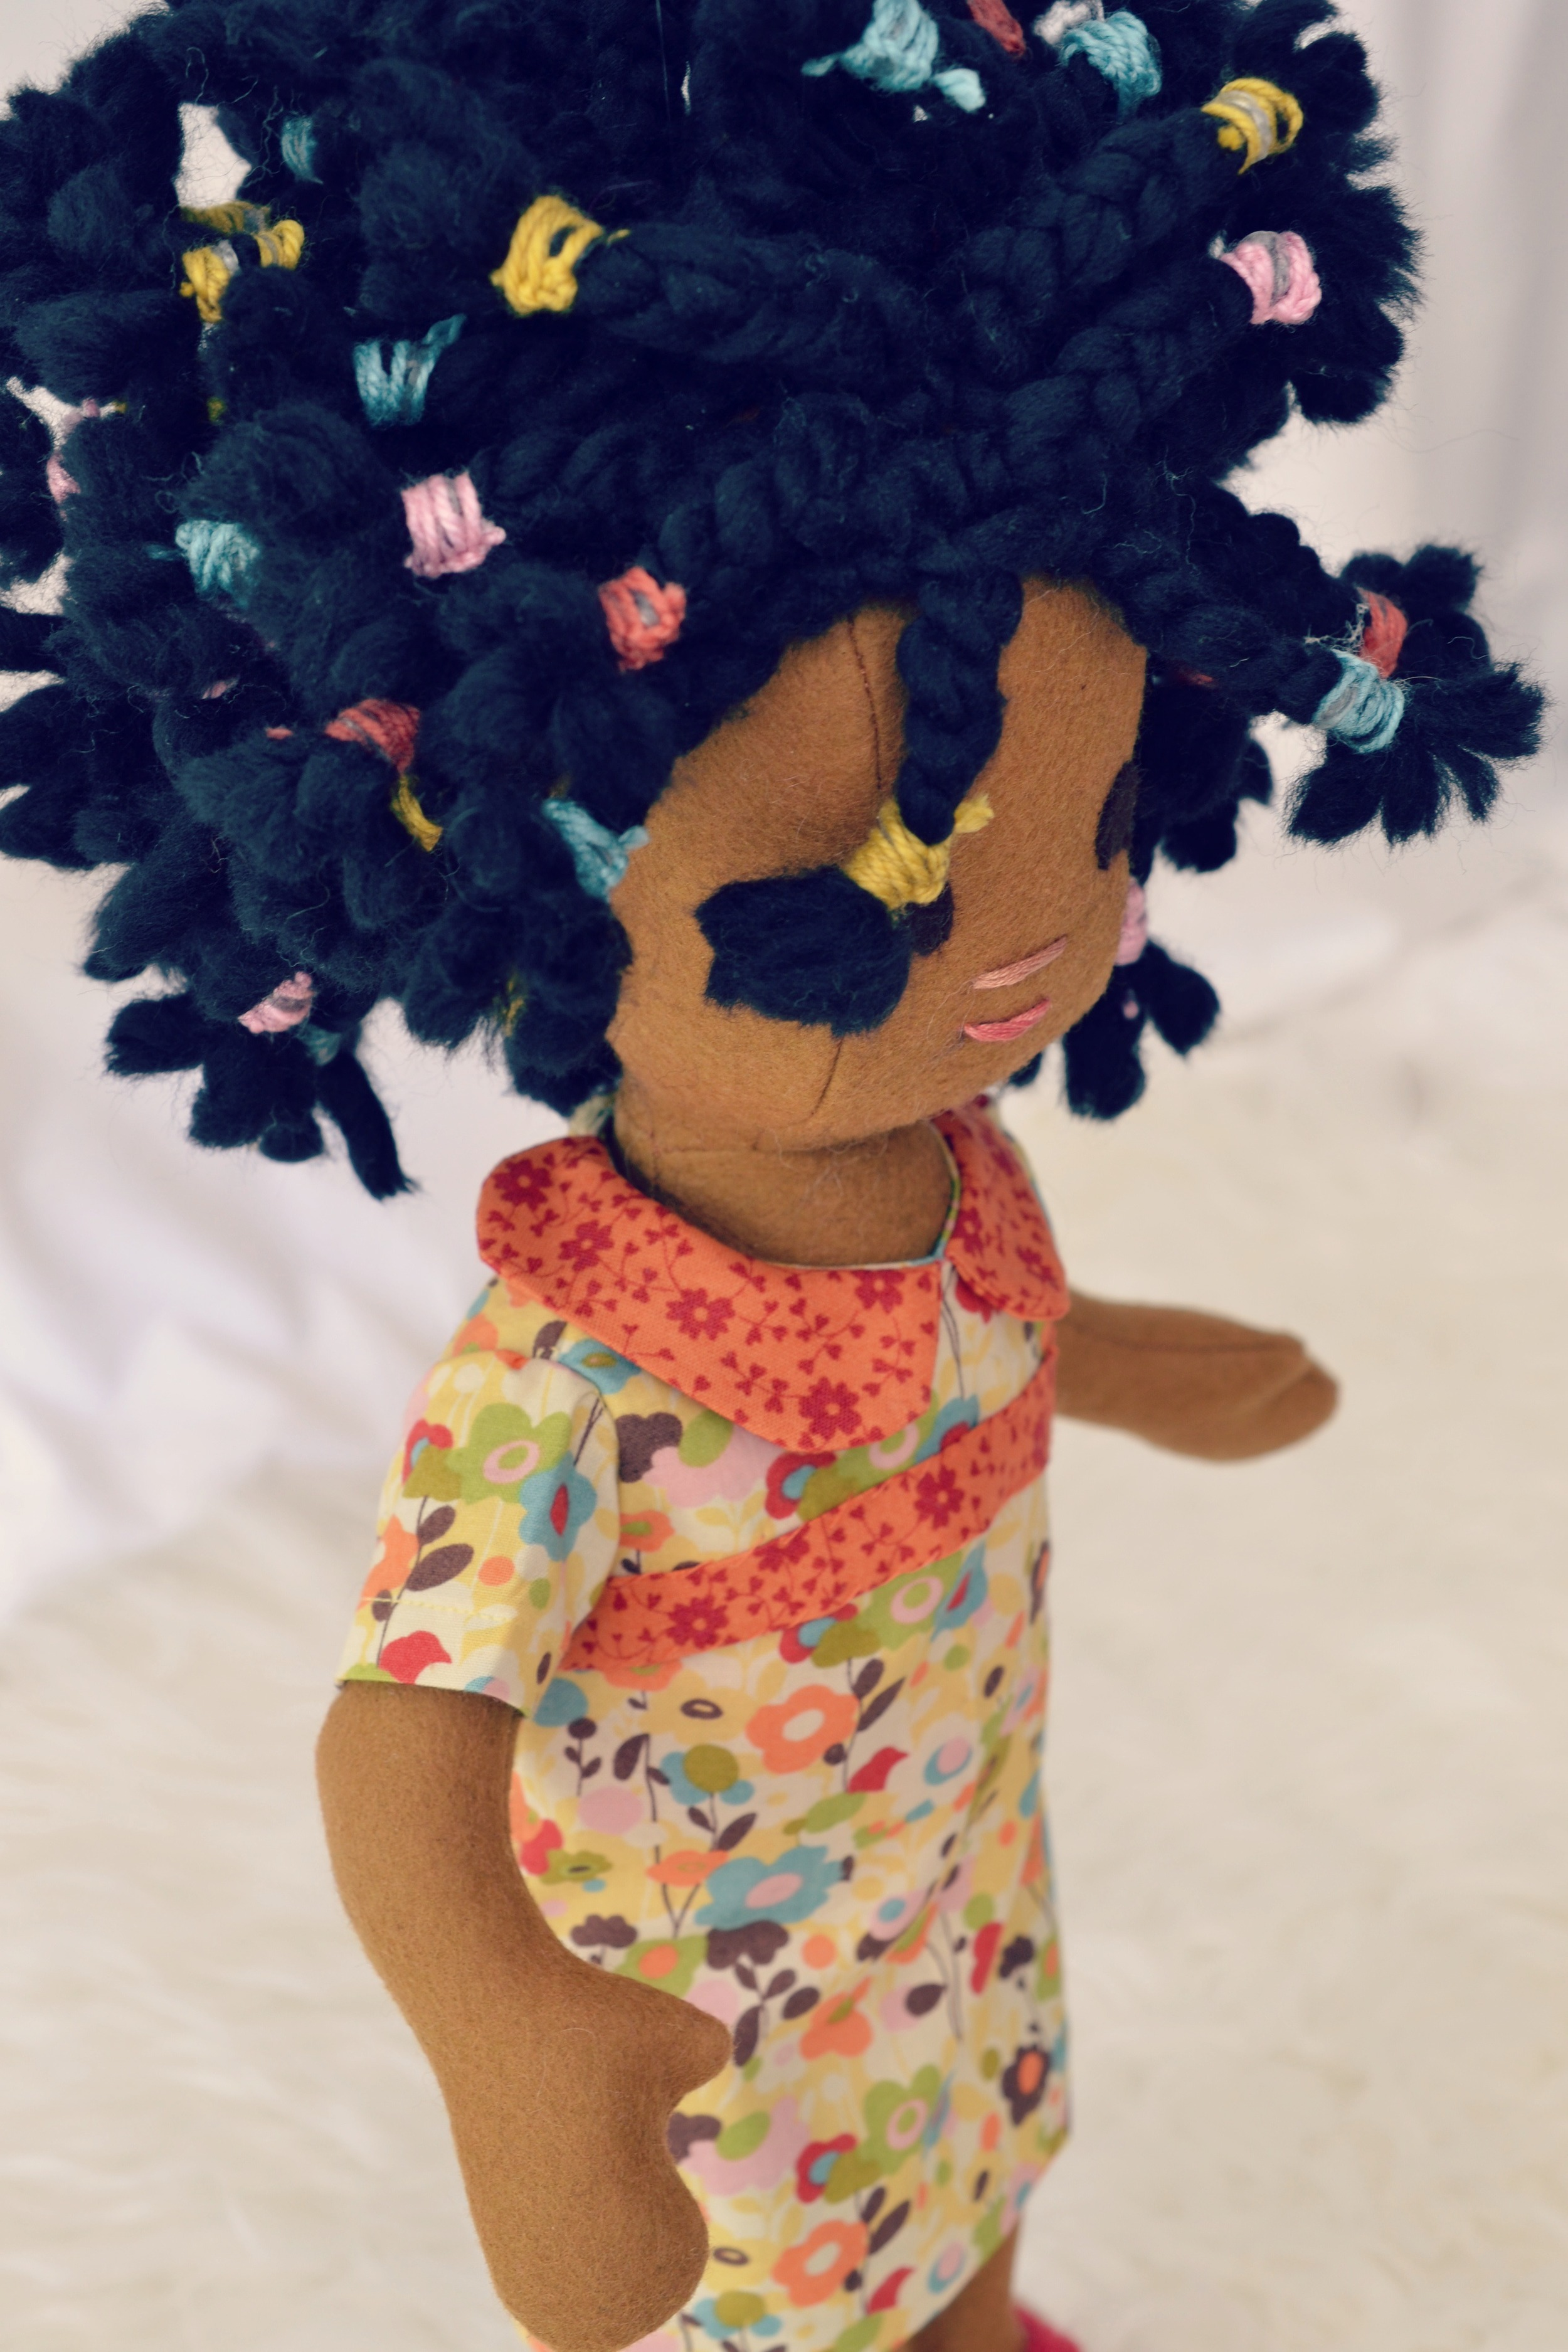 Handmade doll with braids